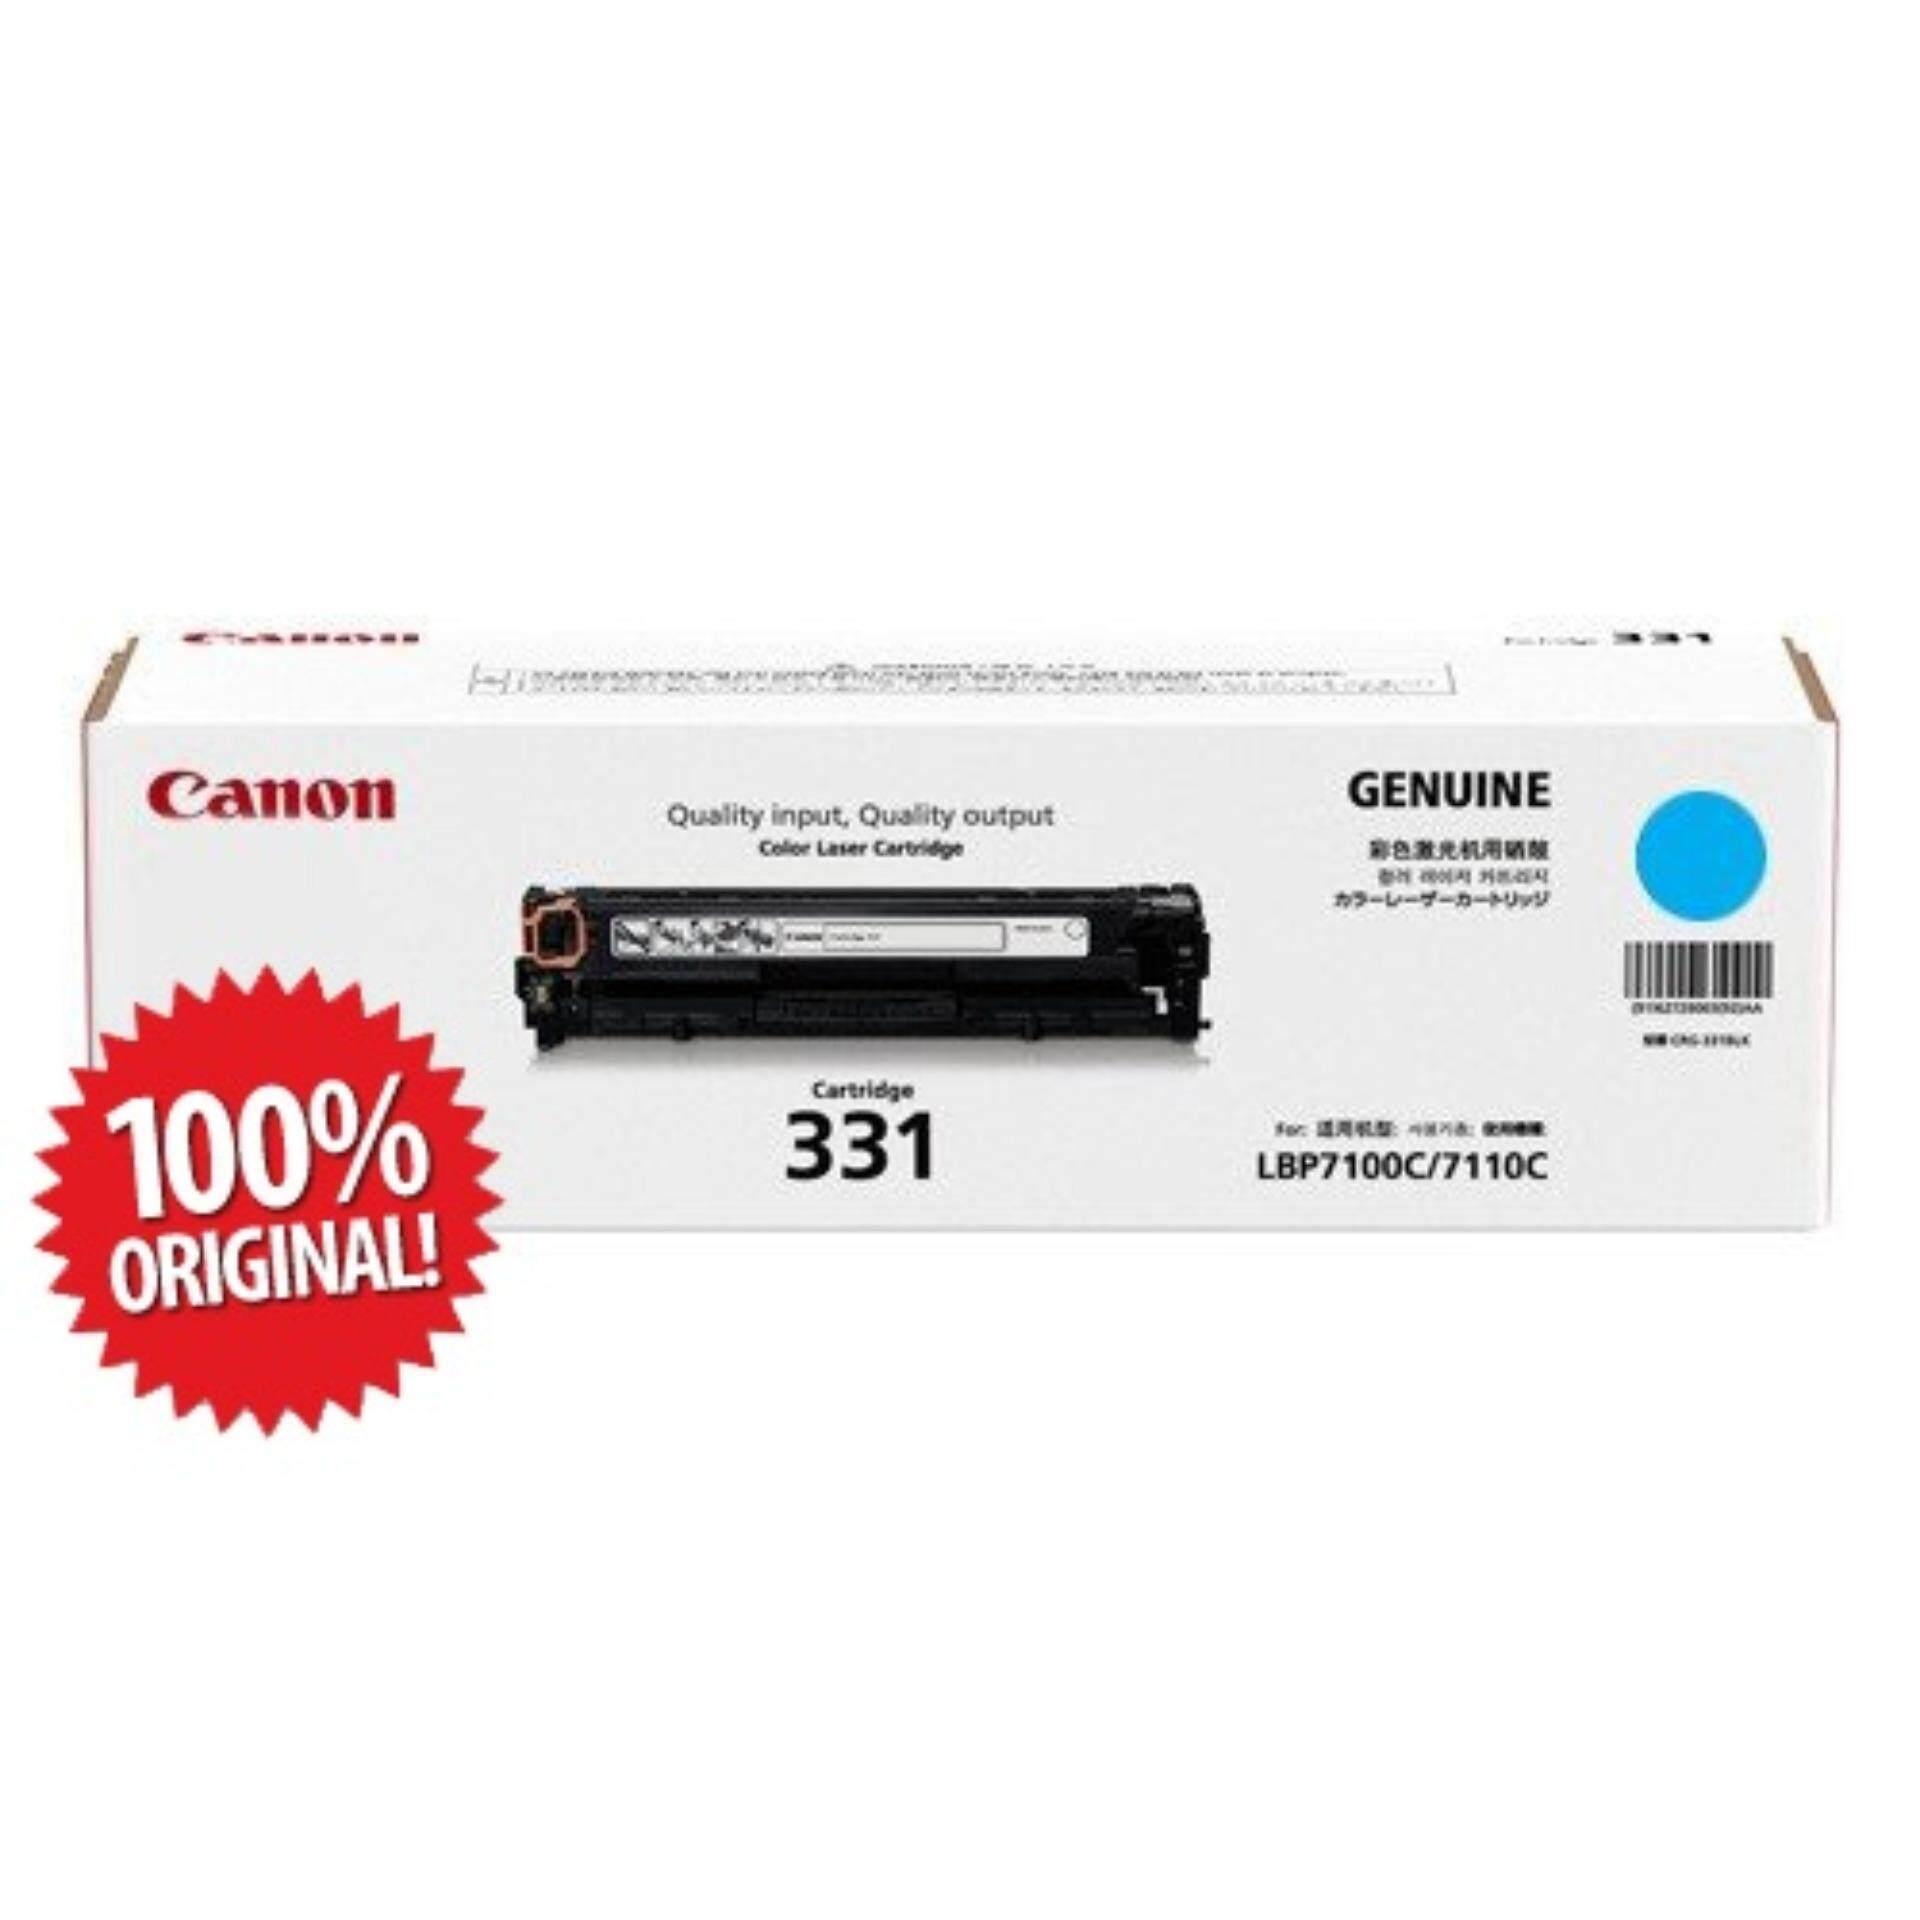 Canon Printers Accessories Price In Malaysia Best Head Ix6560 Genuine Original Cartridge 331 Black Cyan Yellow Magenta